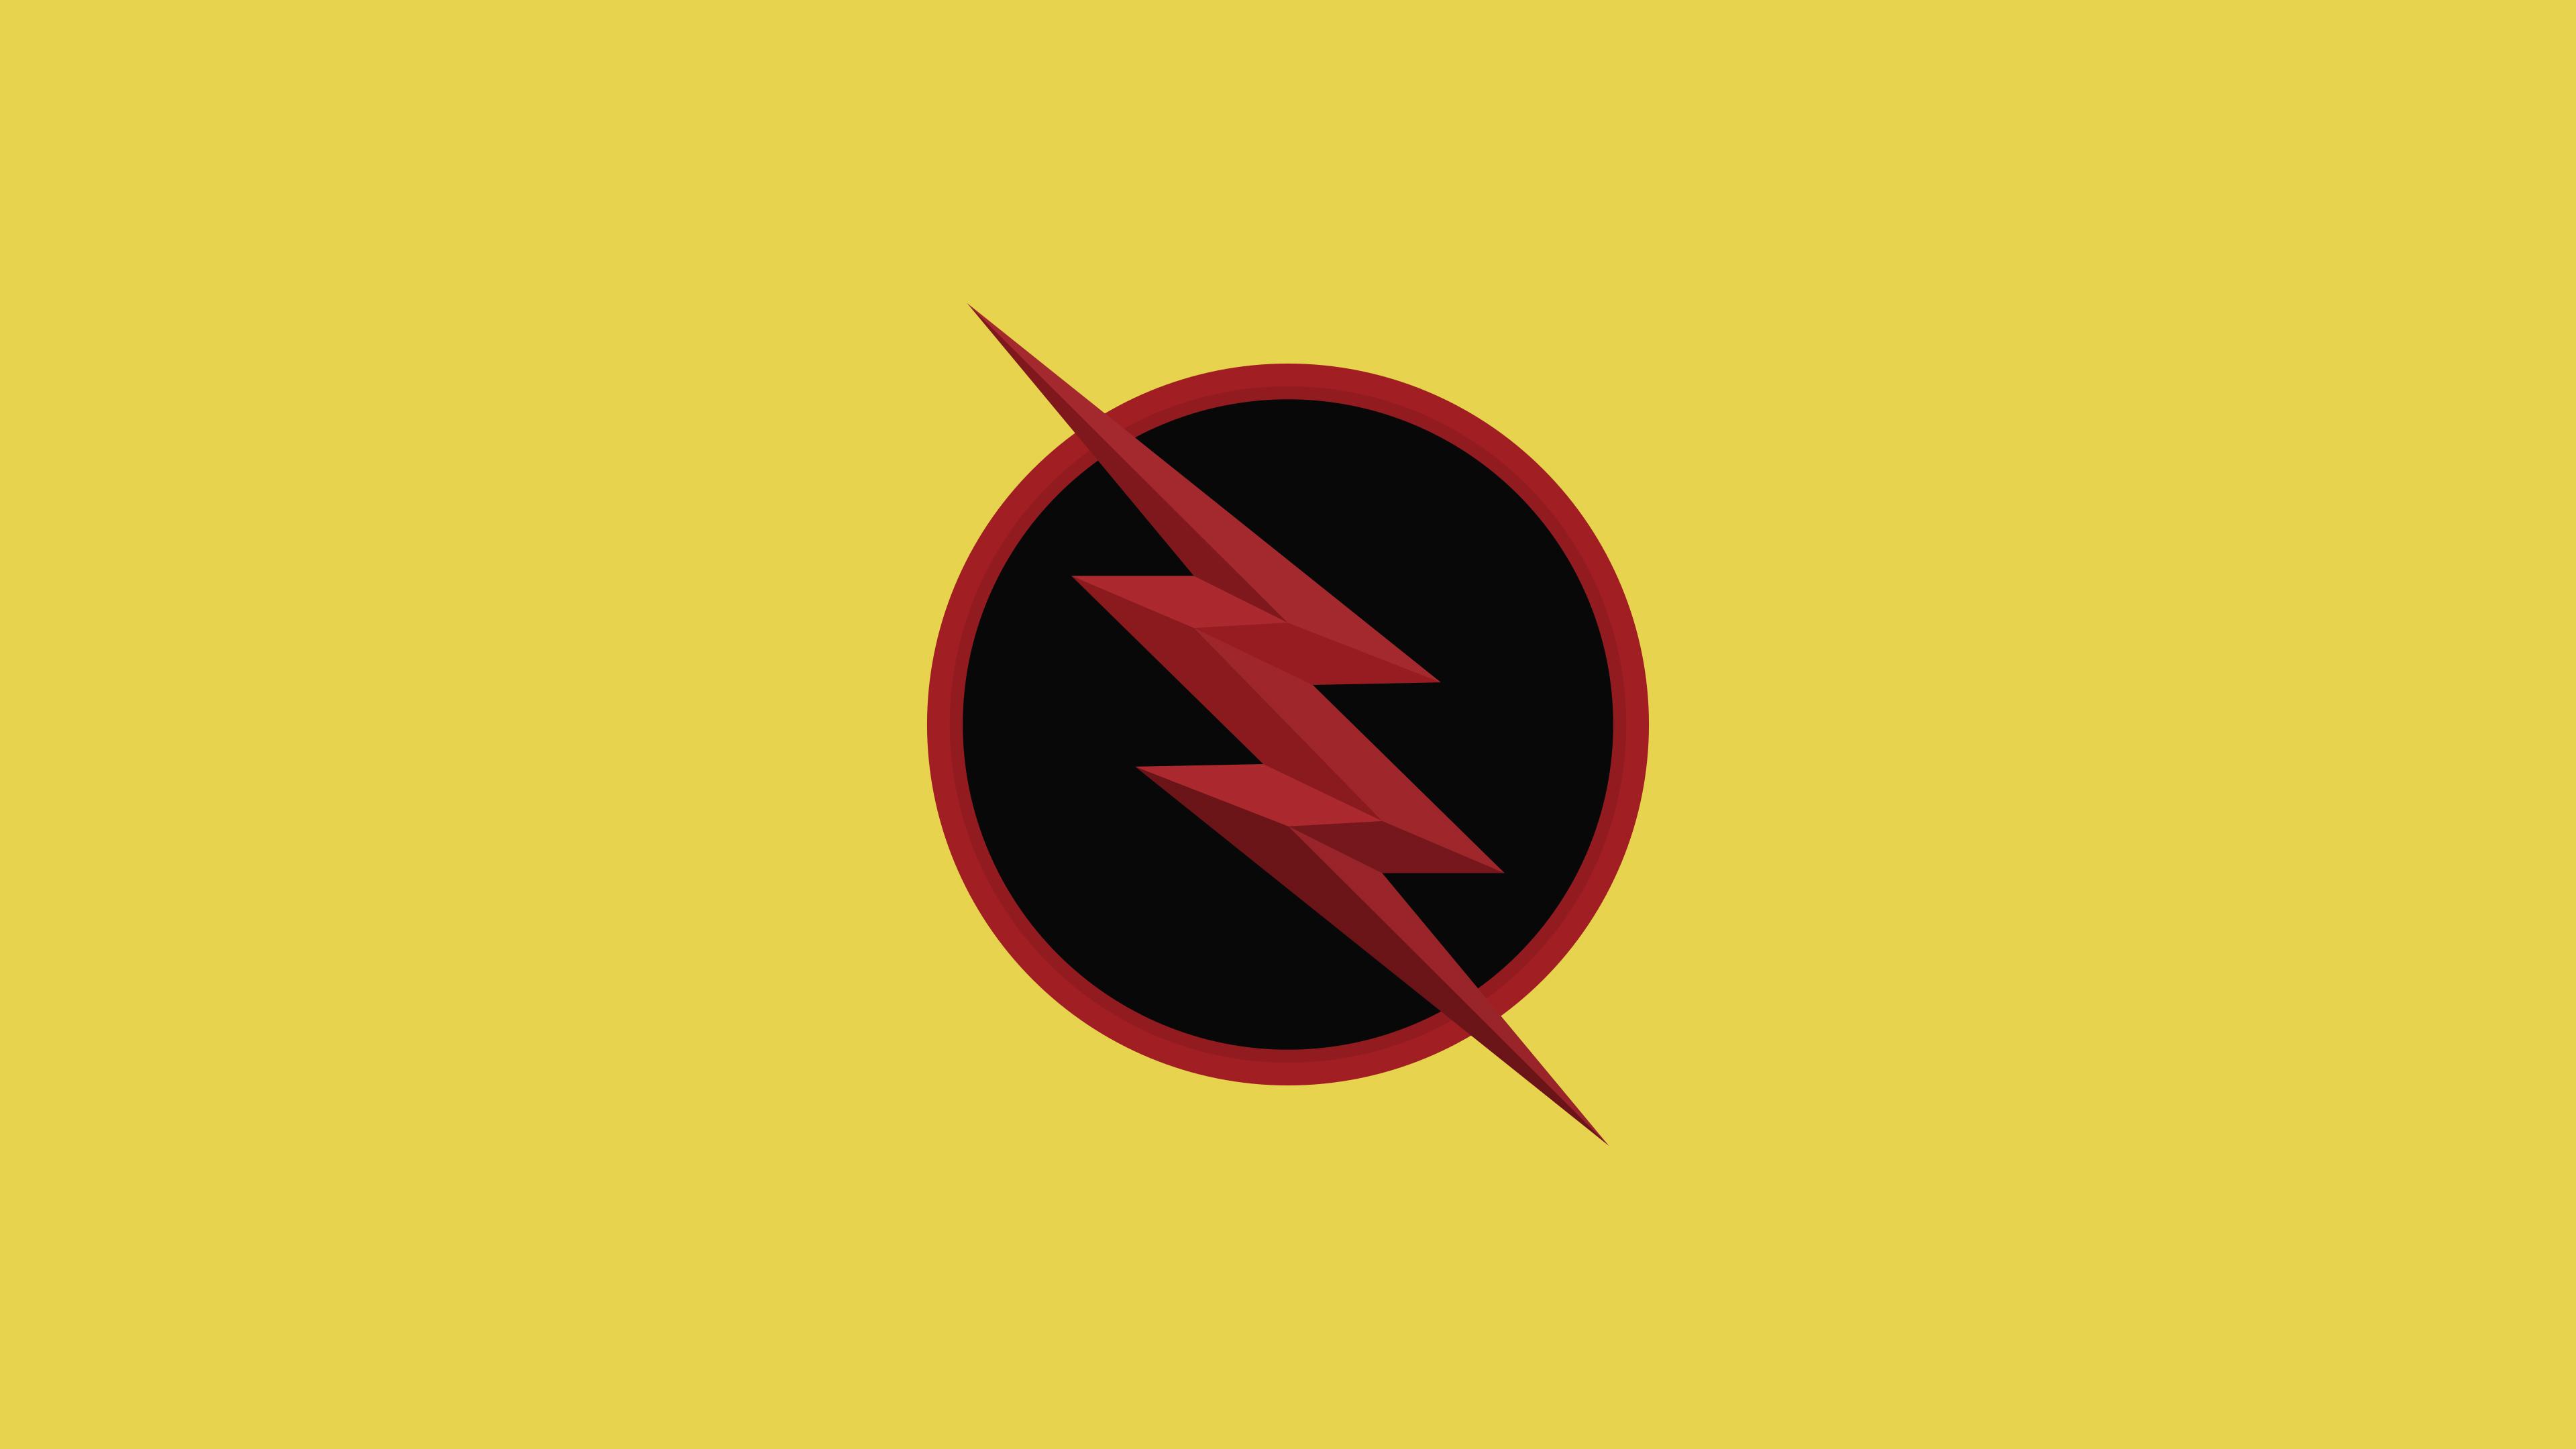 Reverse Flash 4k Hd Superheroes 4k Wallpapers Images Backgrounds